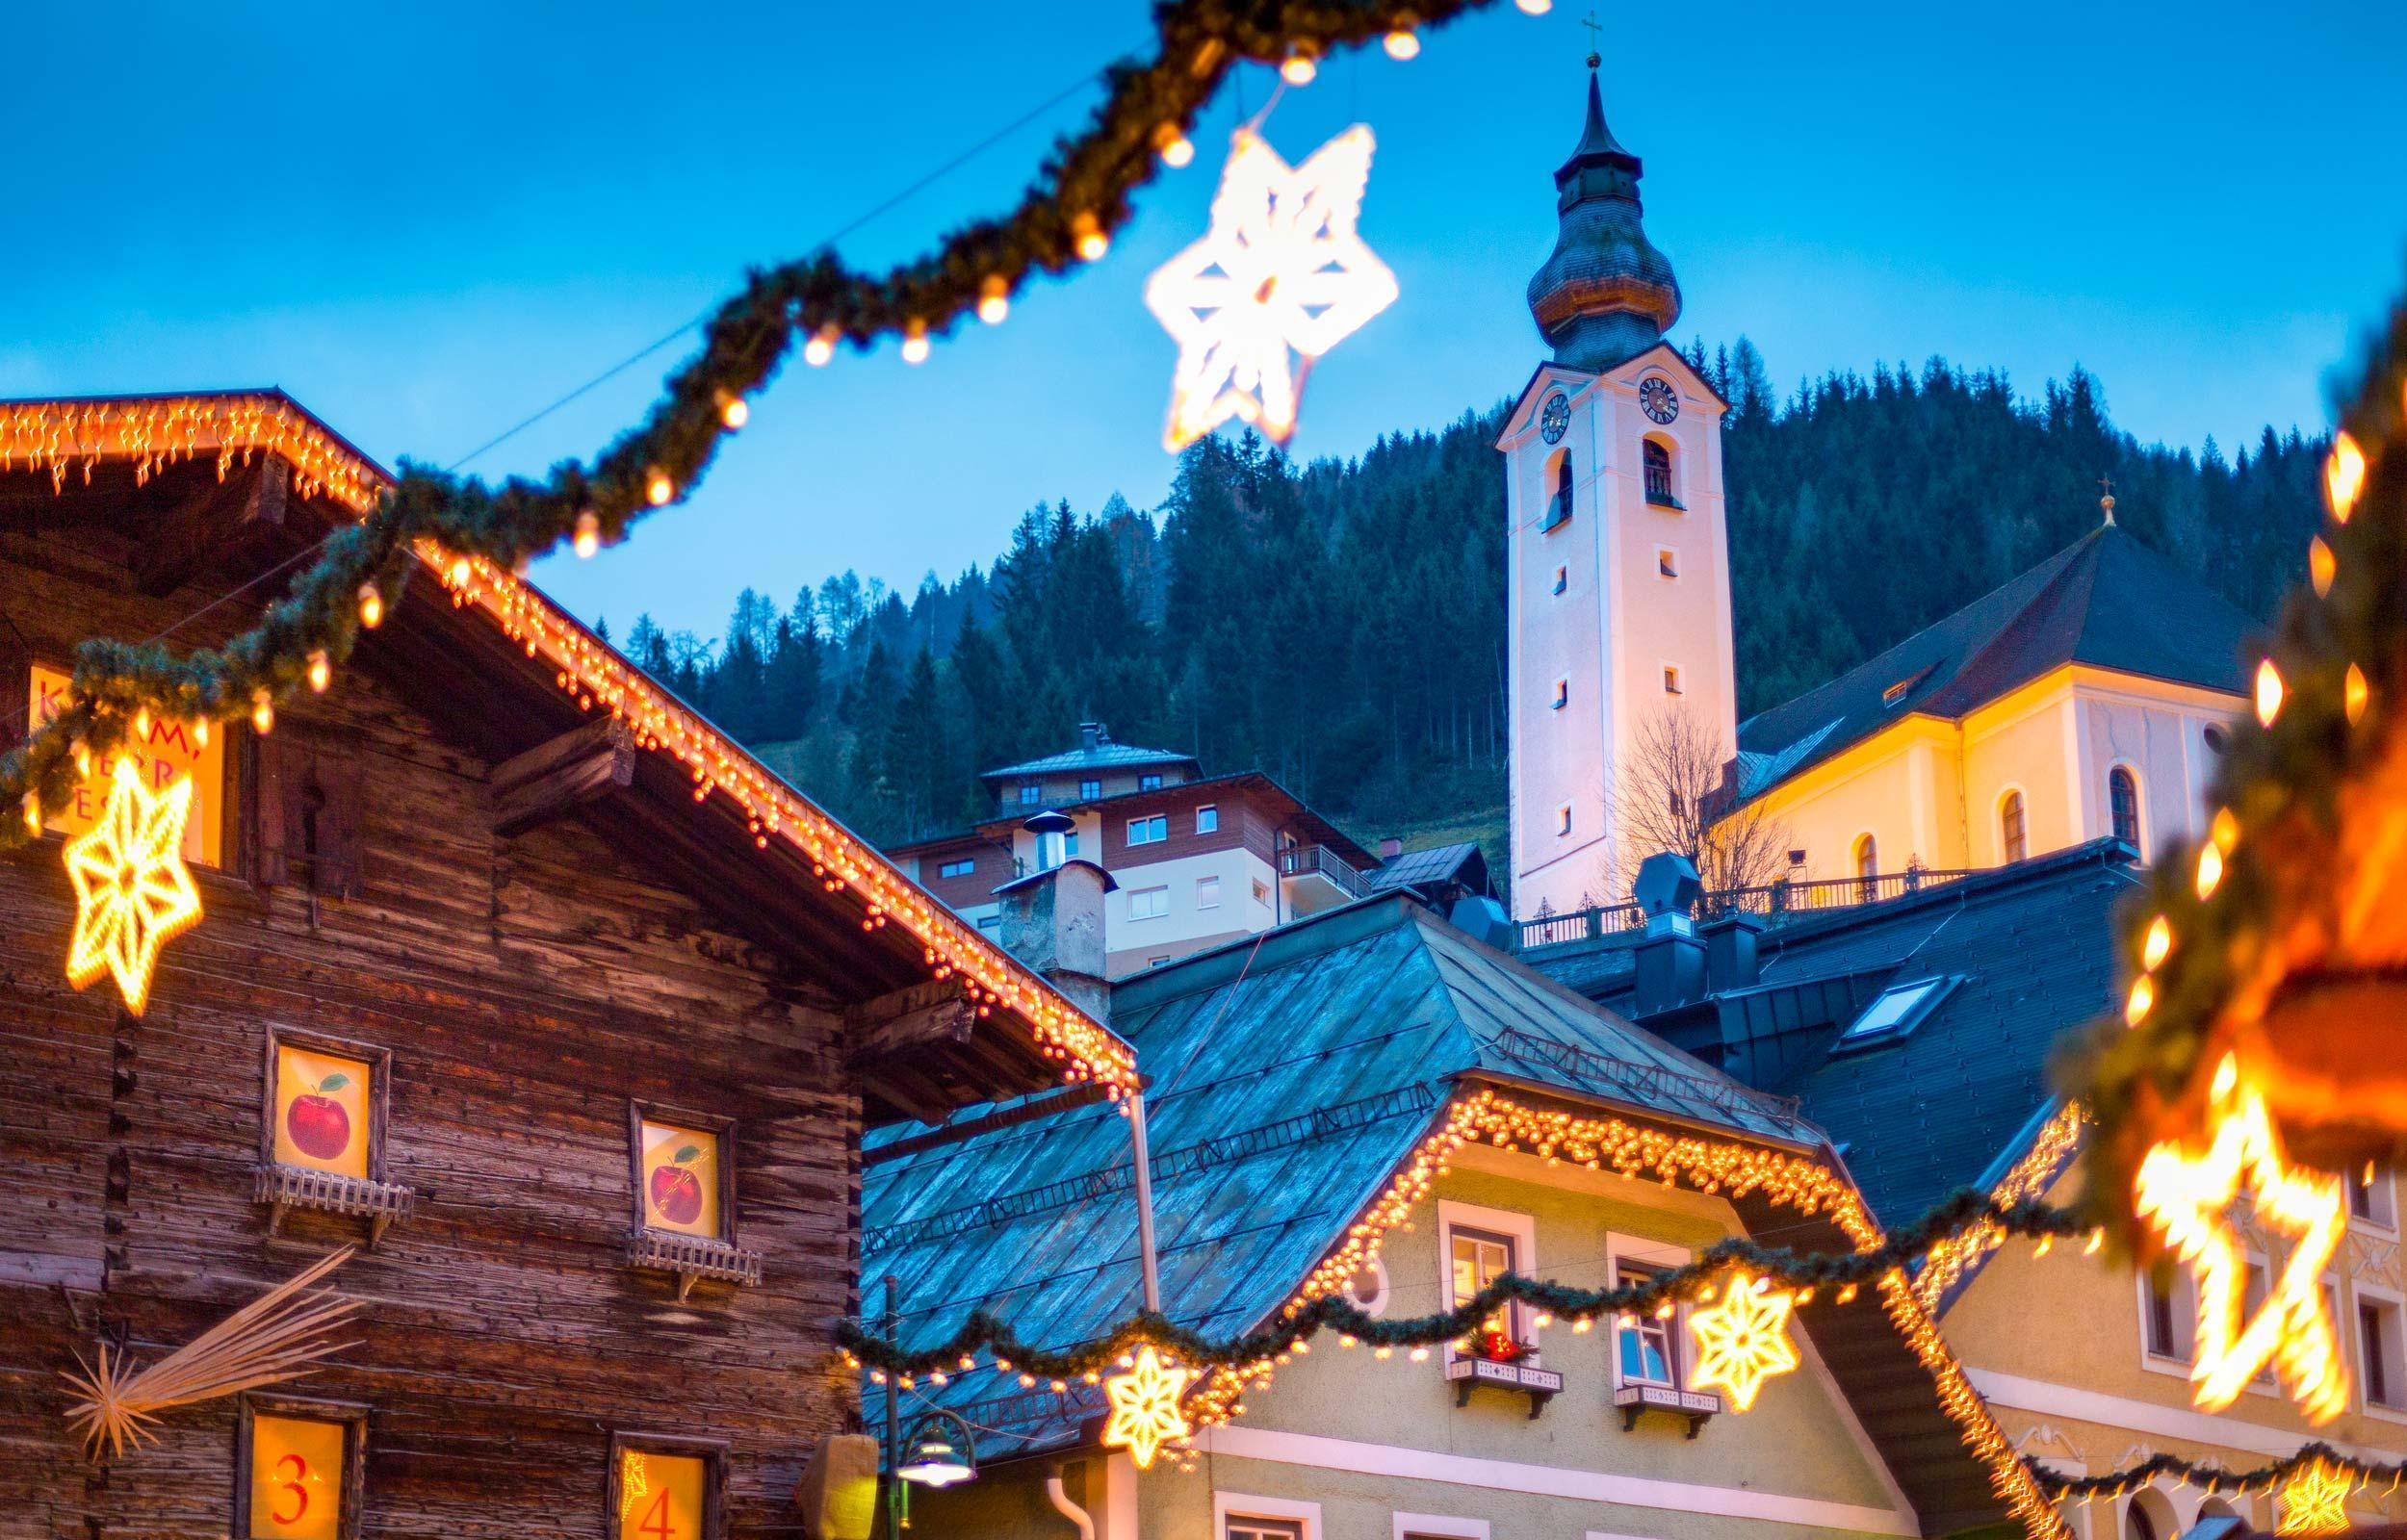 Mercatini di Natale a Salisburgo e nel Salisburghese